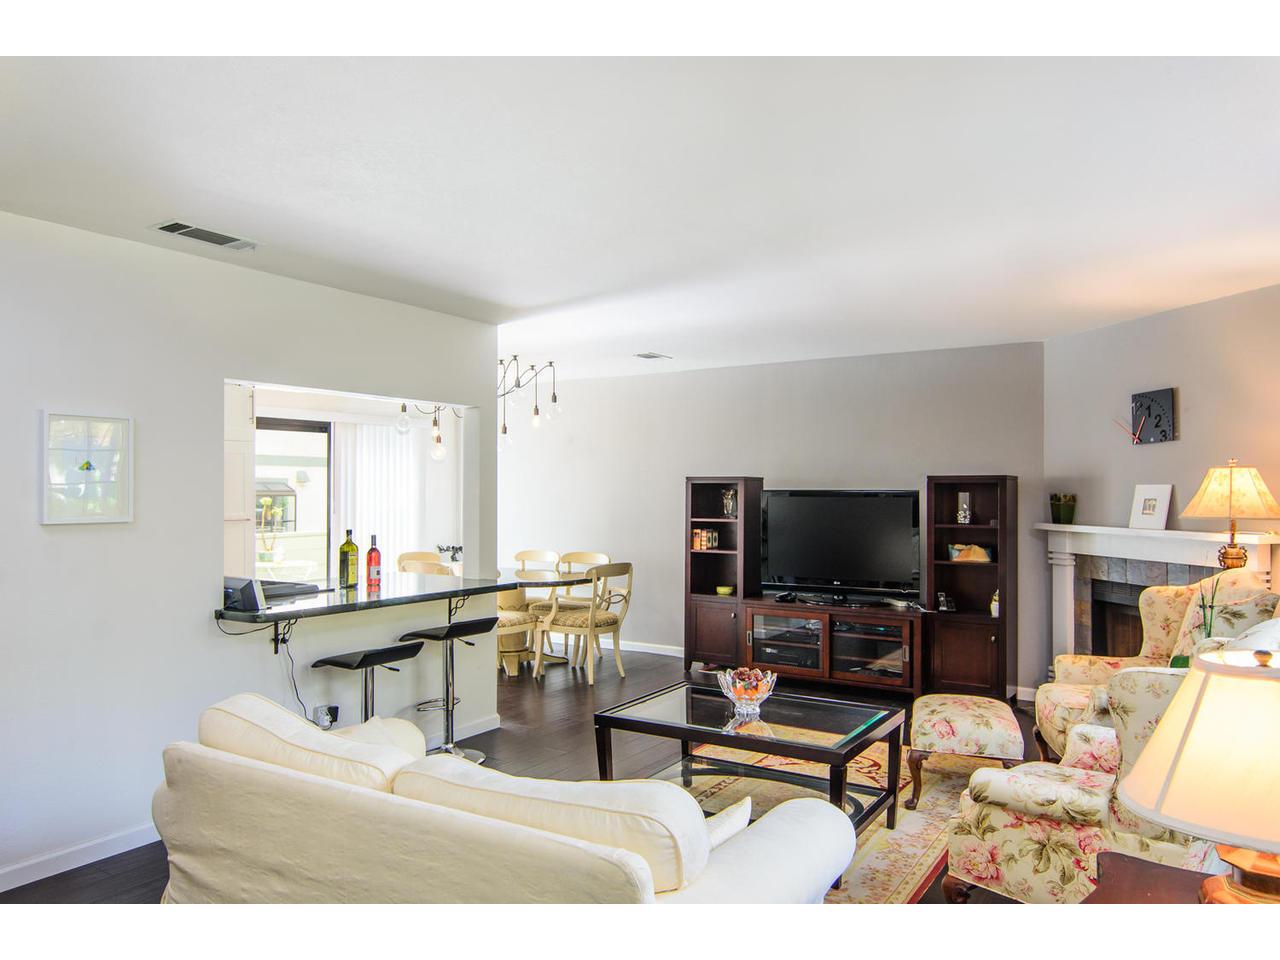 3579 Curlew Street San Diego-MLS_Size-005-3579 Curlew Street San Diego-1280x960-72dpi.jpg